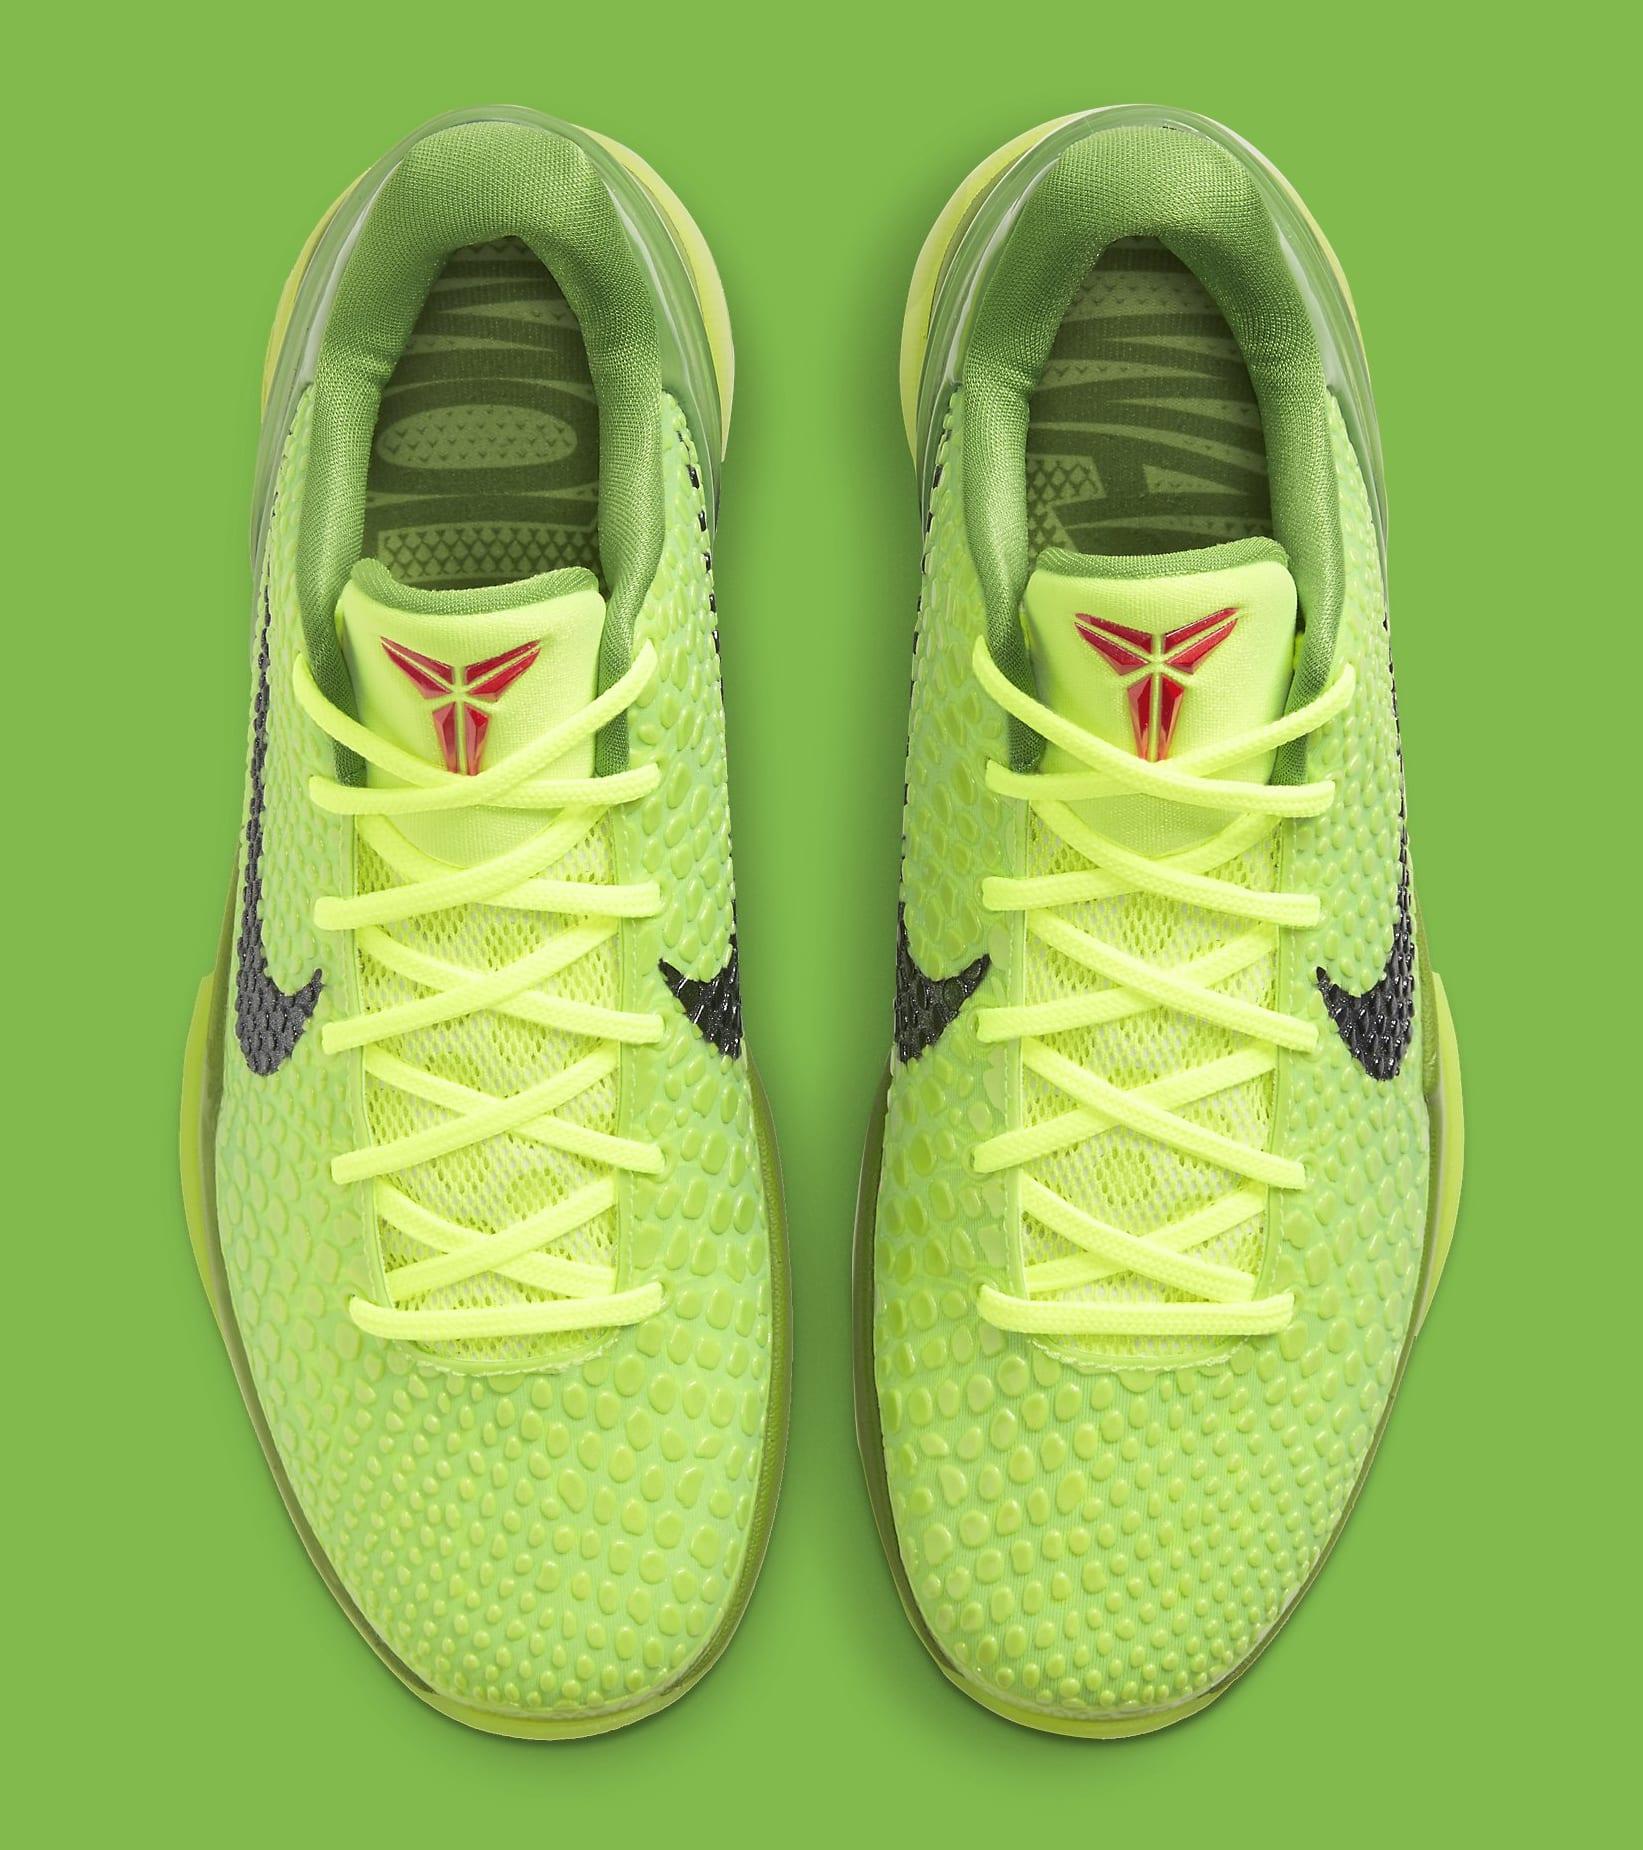 Nike Kobe 6 Protro 'Grinch' CW2190-300 Top